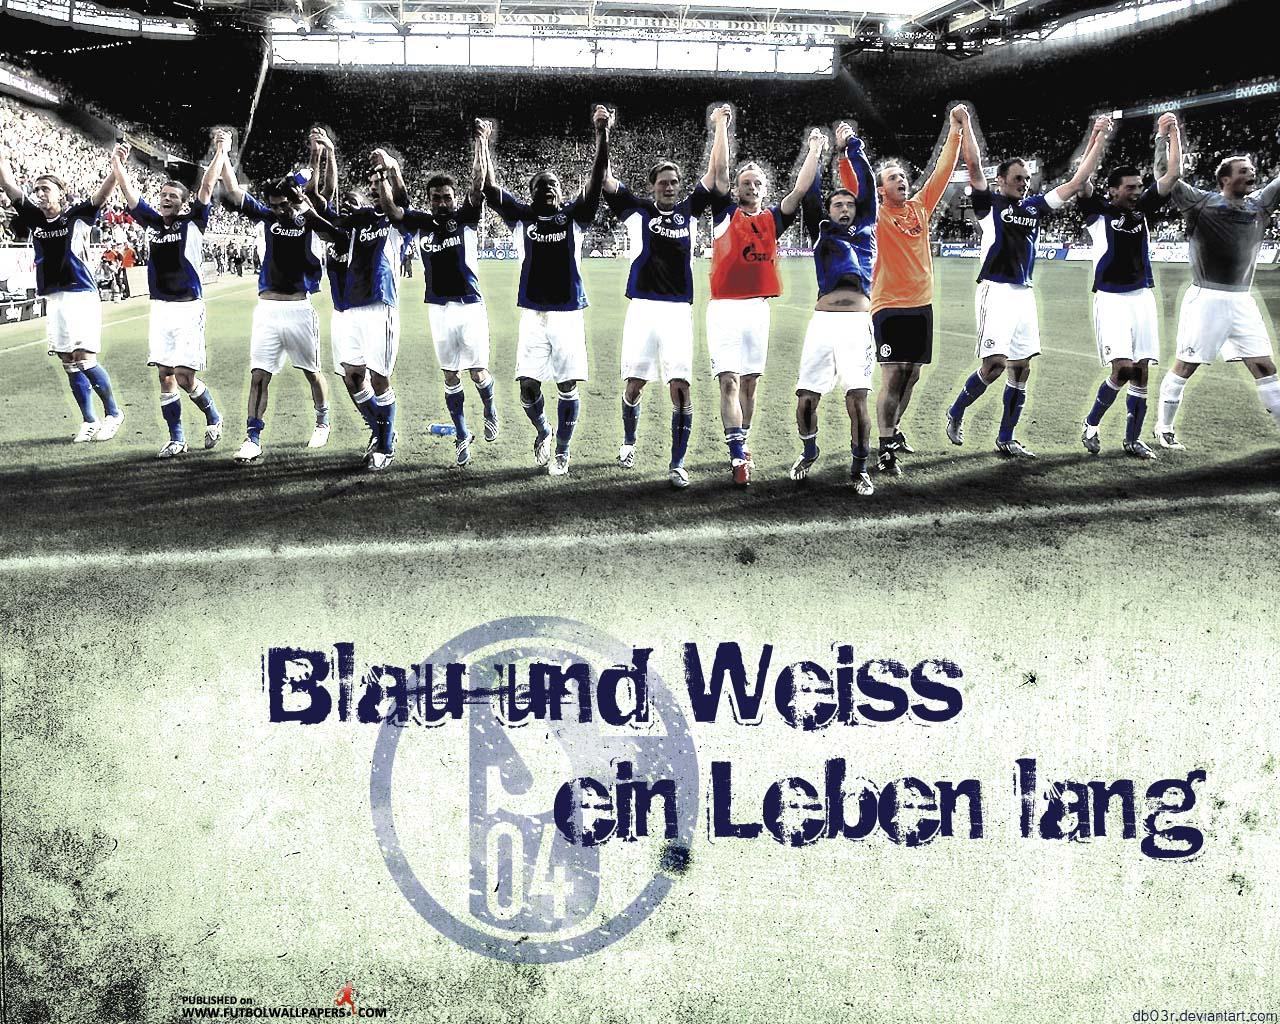 Köln Hintergrundbilder Kostenlos - Kostenlose Bildschirmschoner Bildschirmschoner